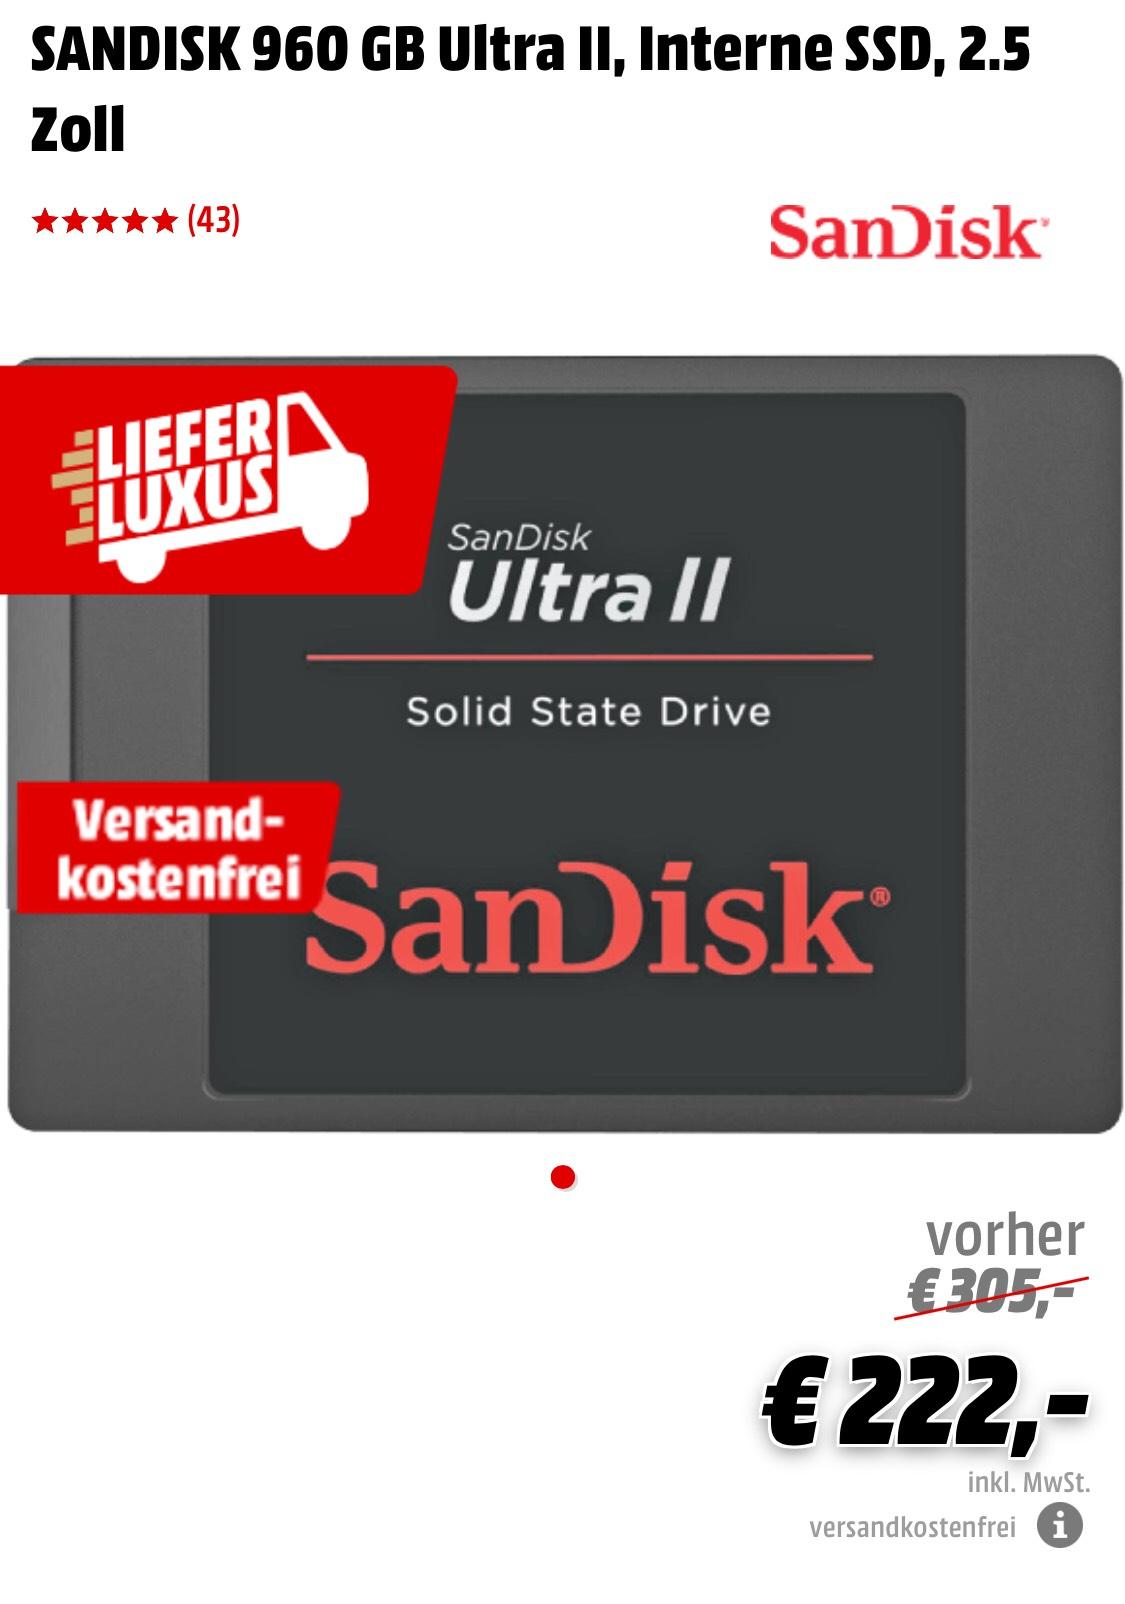 SANDISK 960 GB Ultra II, Interne SSD, 2.5 Zoll